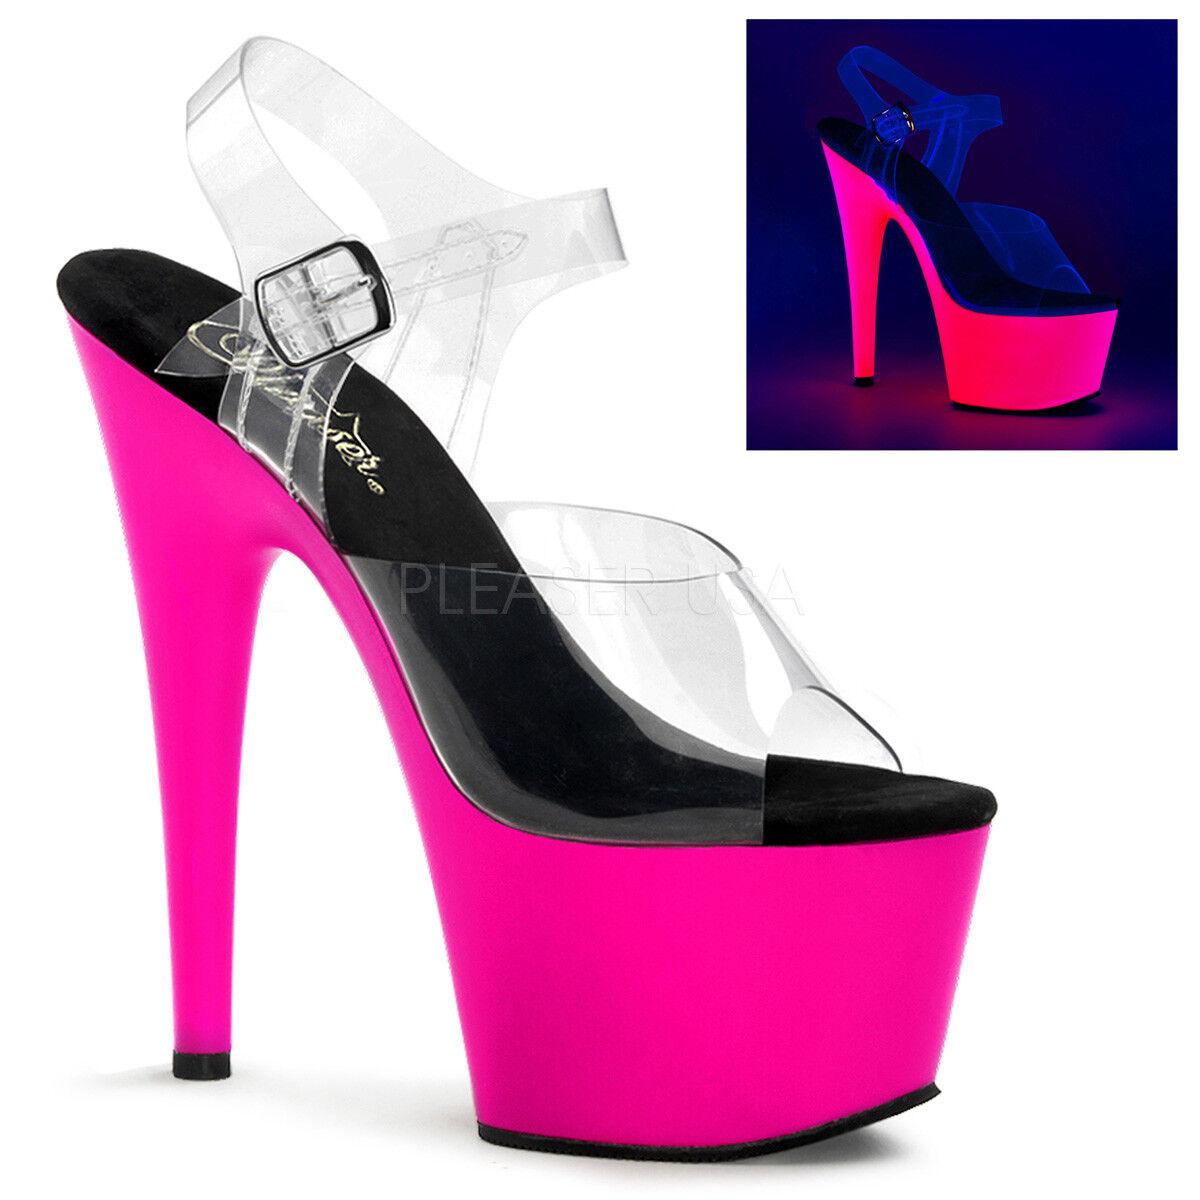 PLEASER ADORE 708UV NEON DANCING PINK PLATFORM POLE DANCING NEON STILETTO SANDALS Schuhe adc105